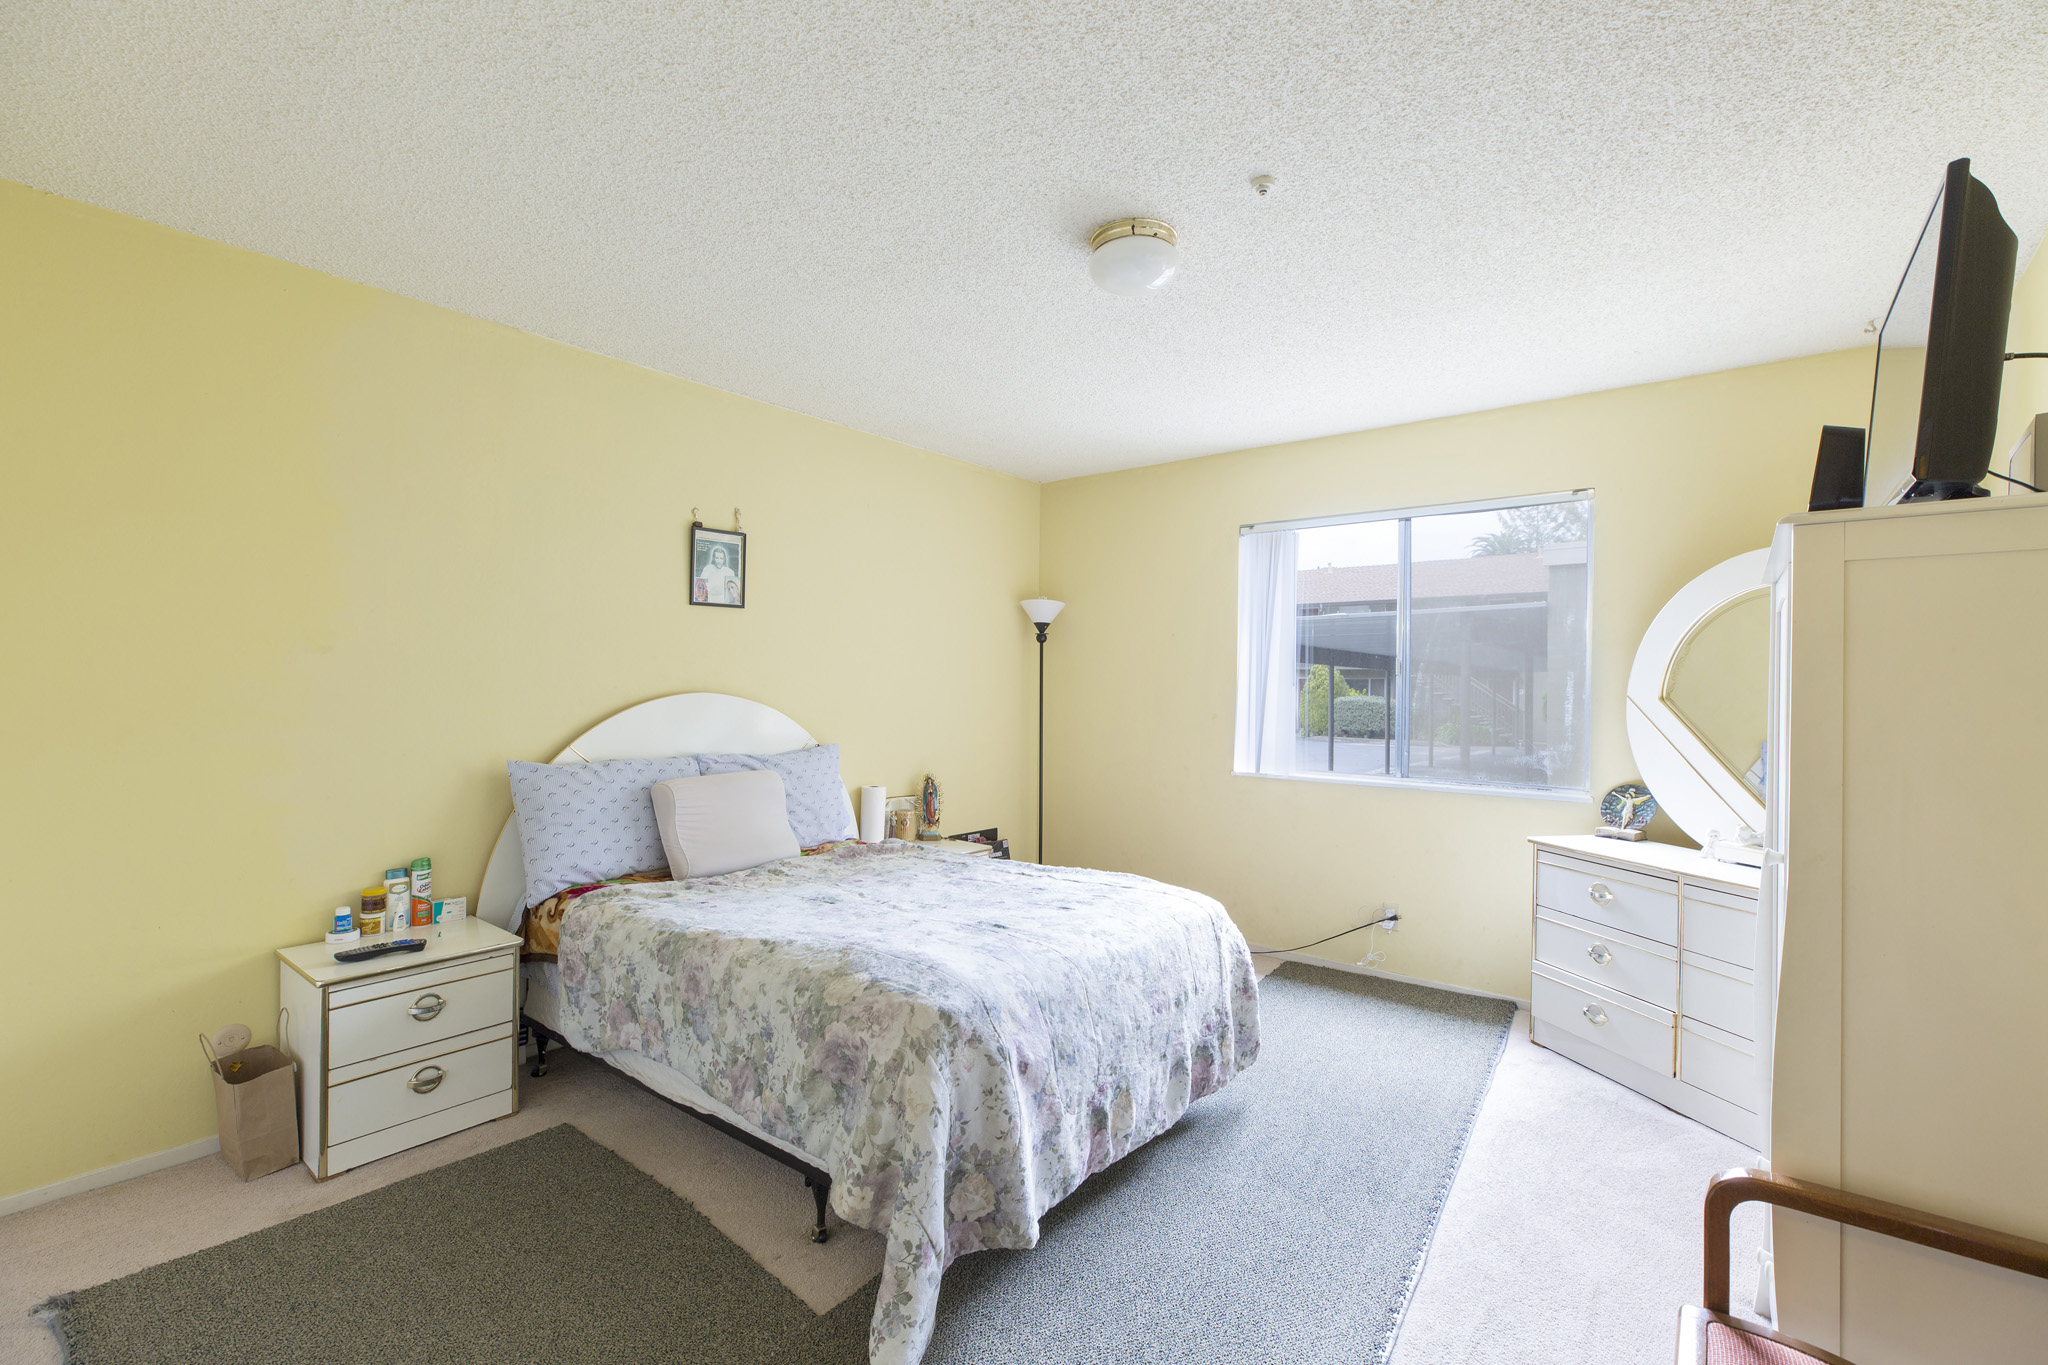 Bedroom1 - Tatiana McWilliams.jpg